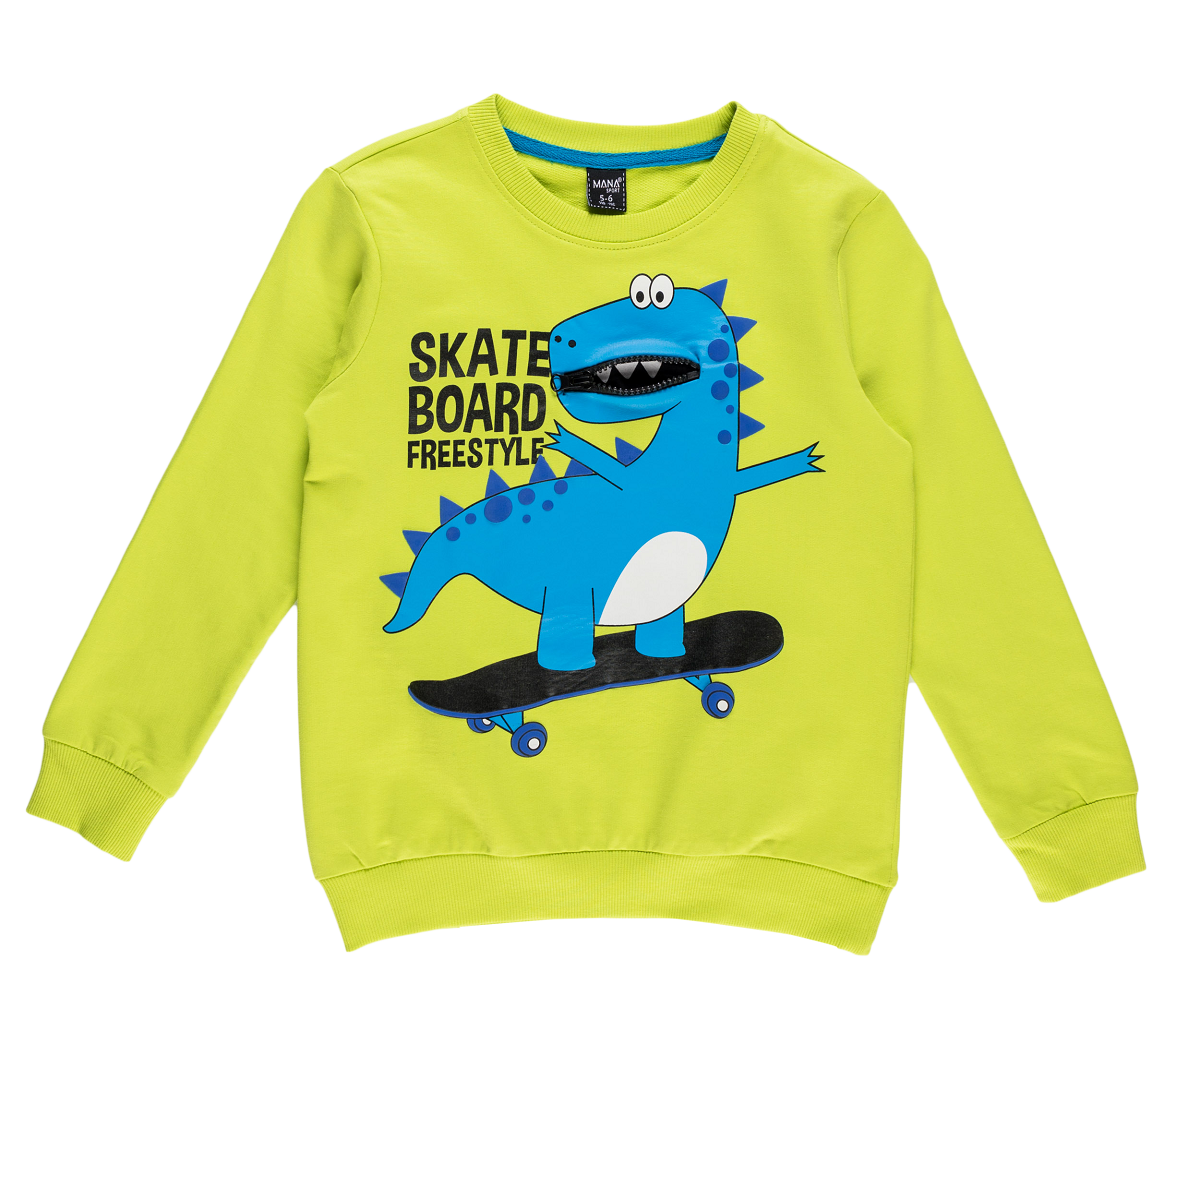 Fantovski pulover, svetlo zelena